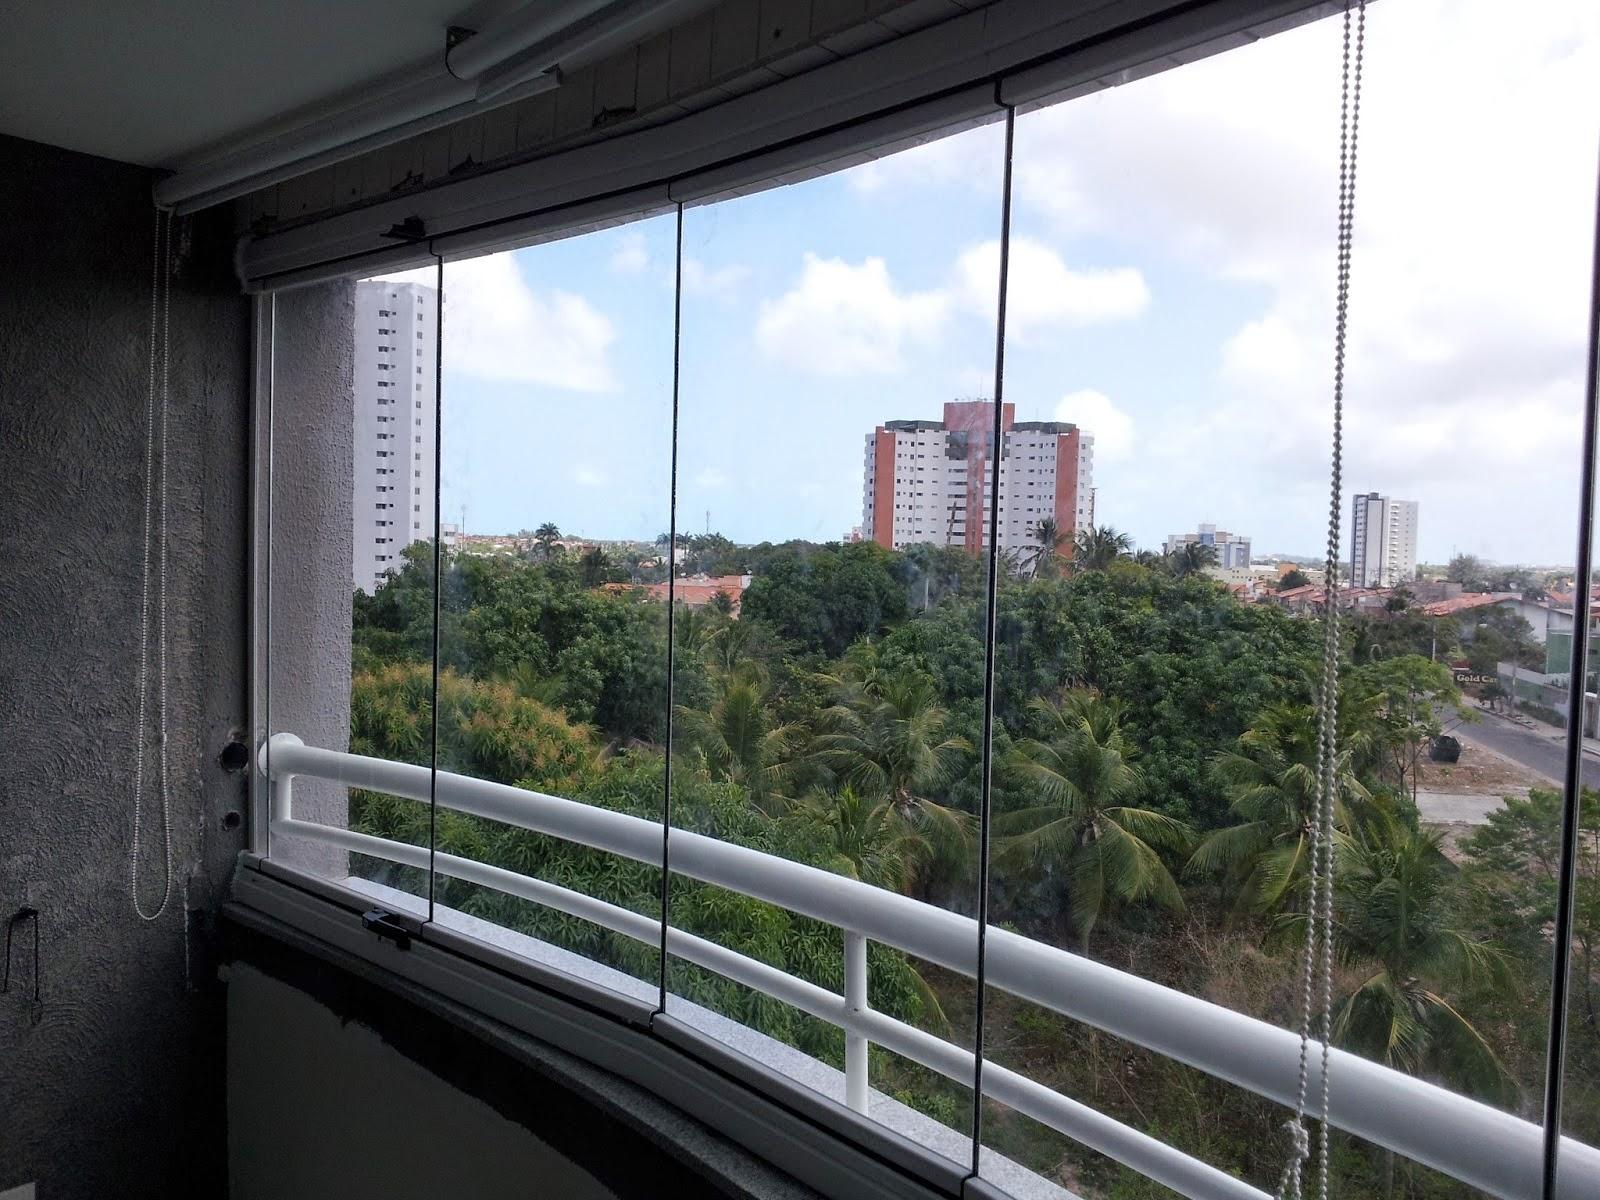 #2D609E Criativo Vidraçaria: Cortina de vidro em Fortaleza 40 Janelas De Vidro Cortina